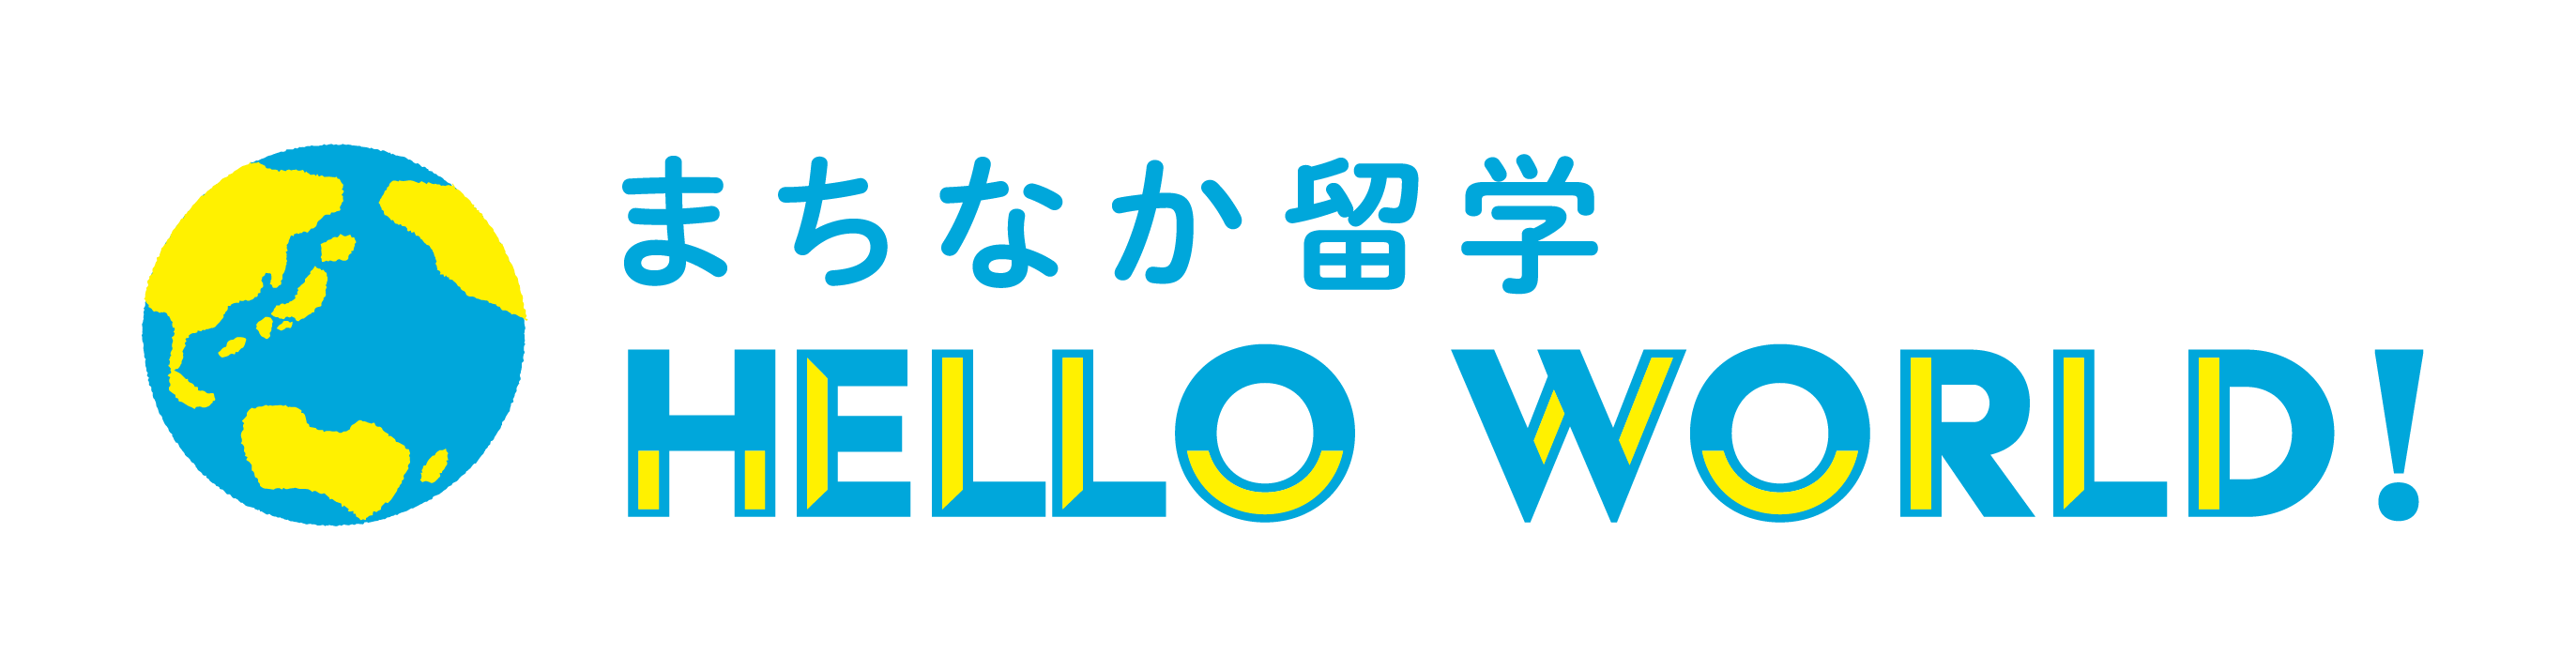 HelloWorld株式会社